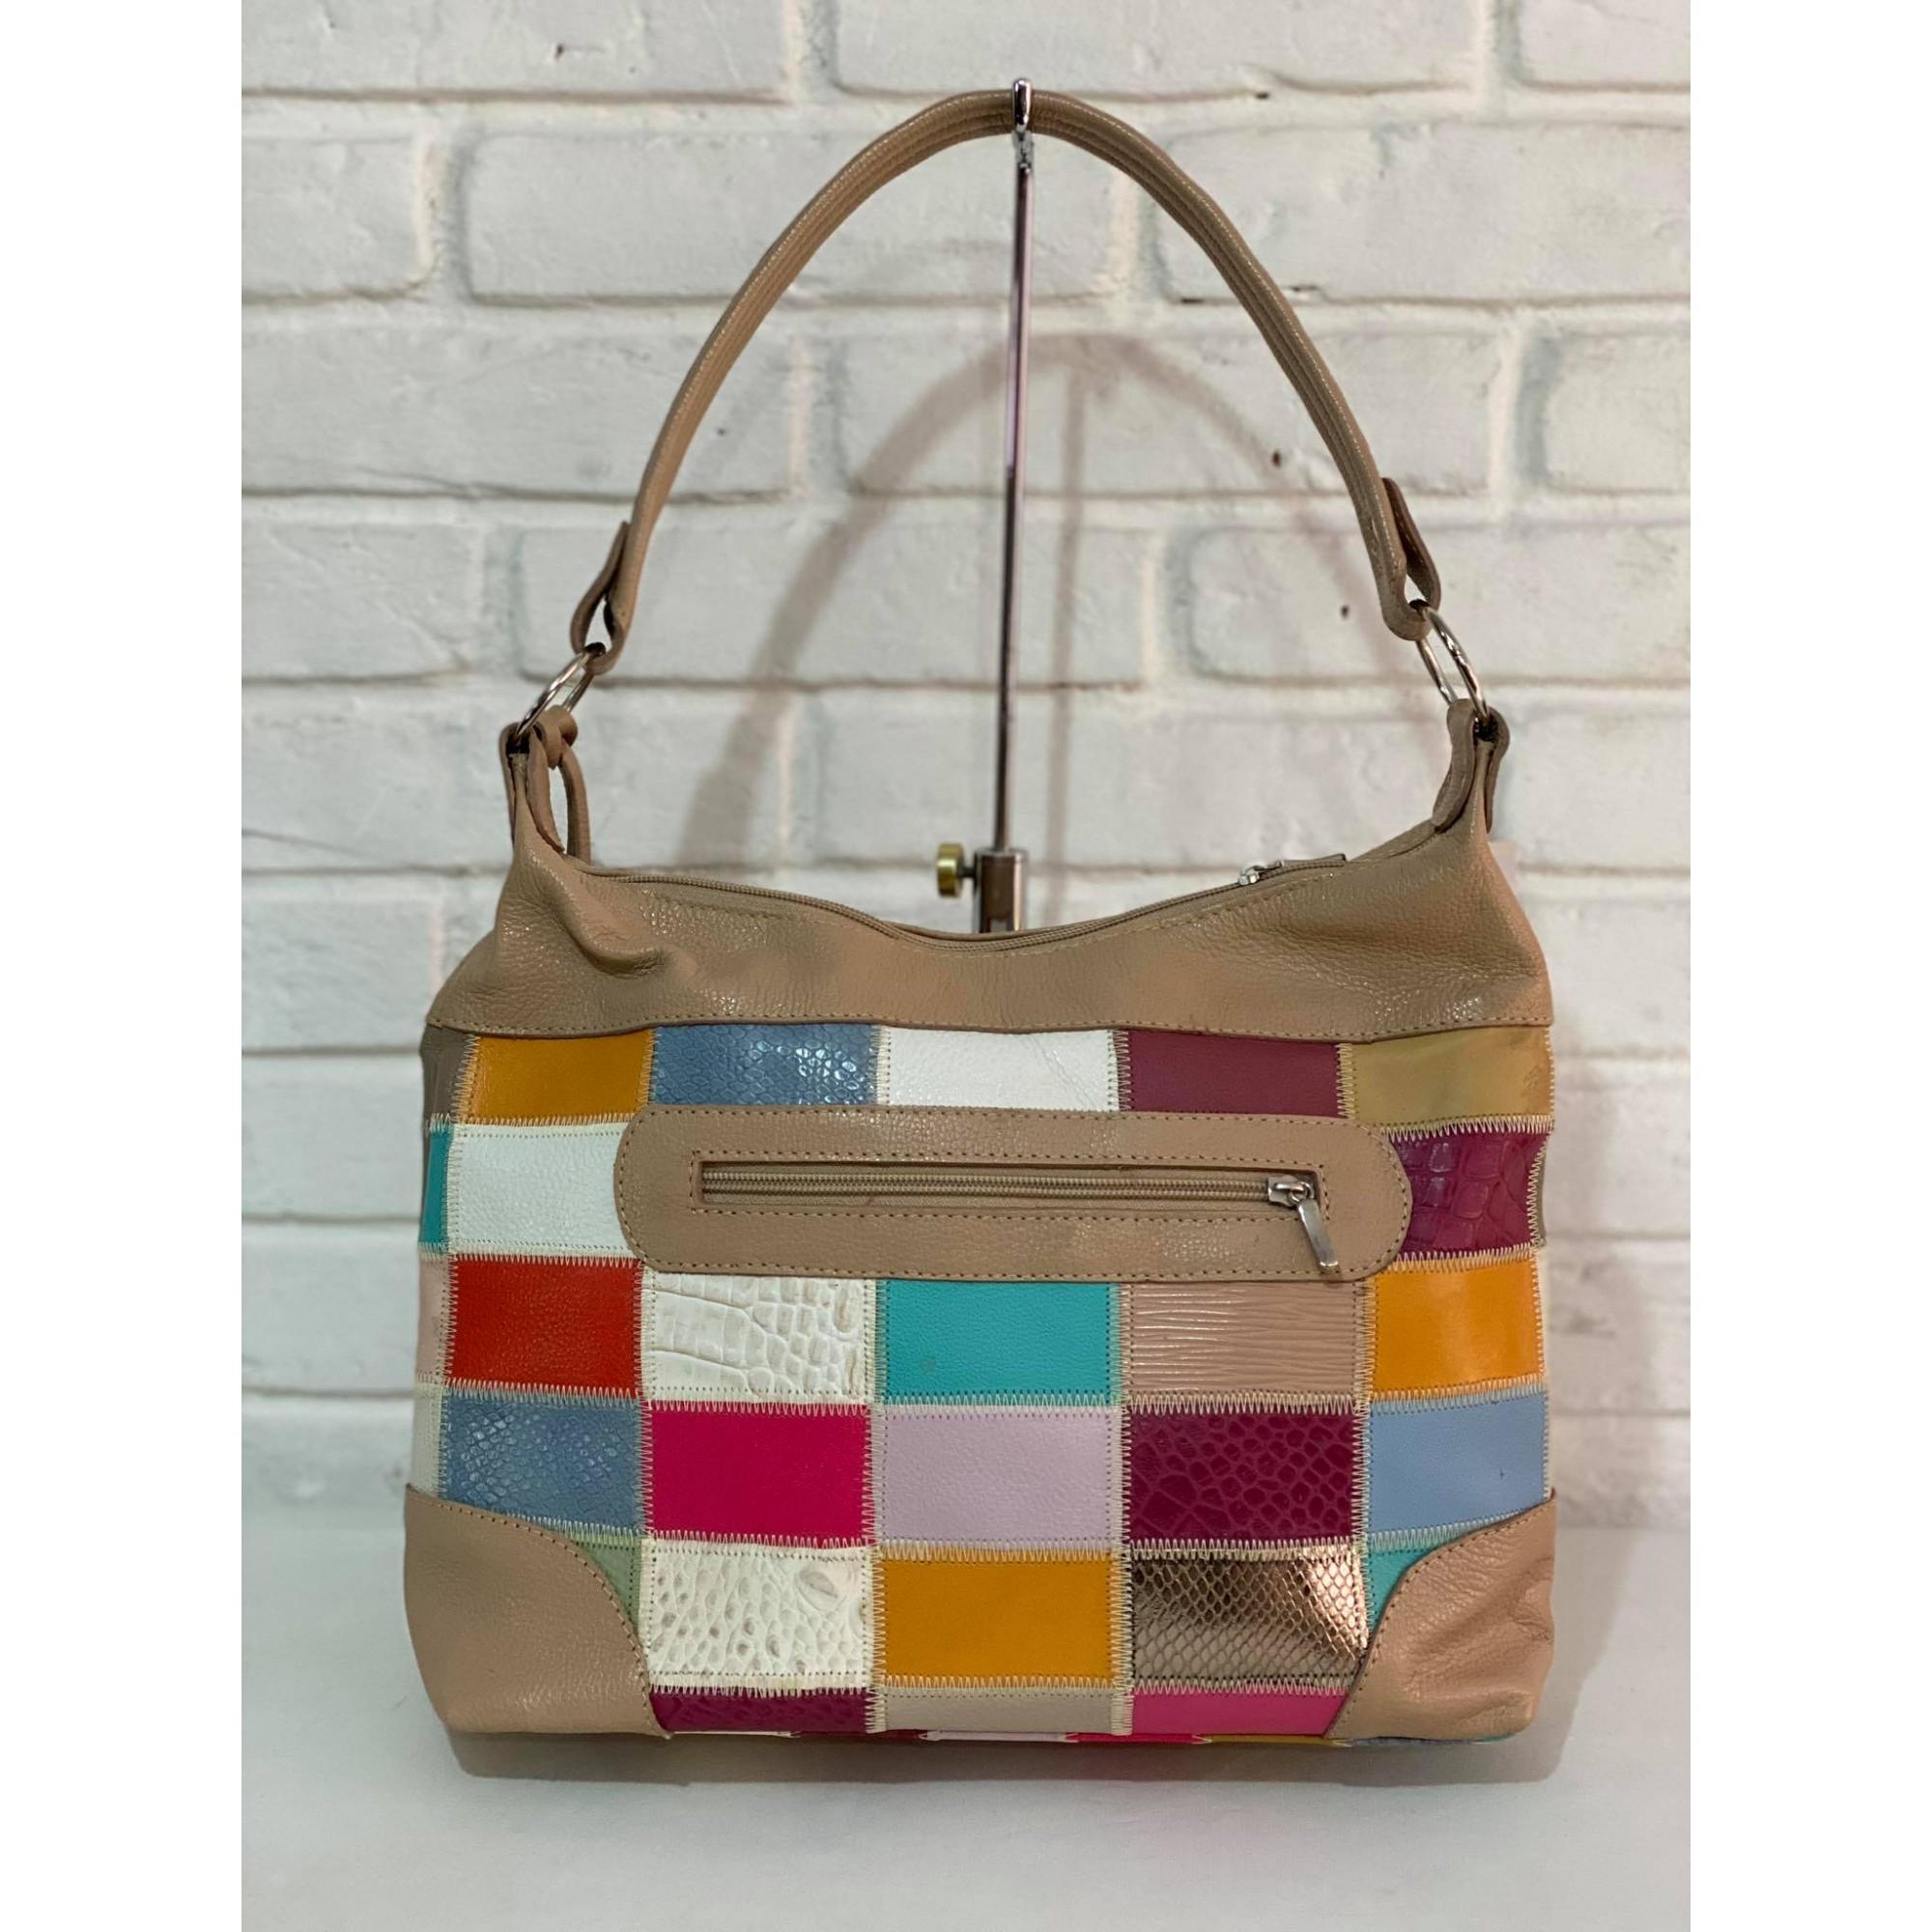 Bolsa Prata Couro Patchwork 1010608 Bege/Colorida